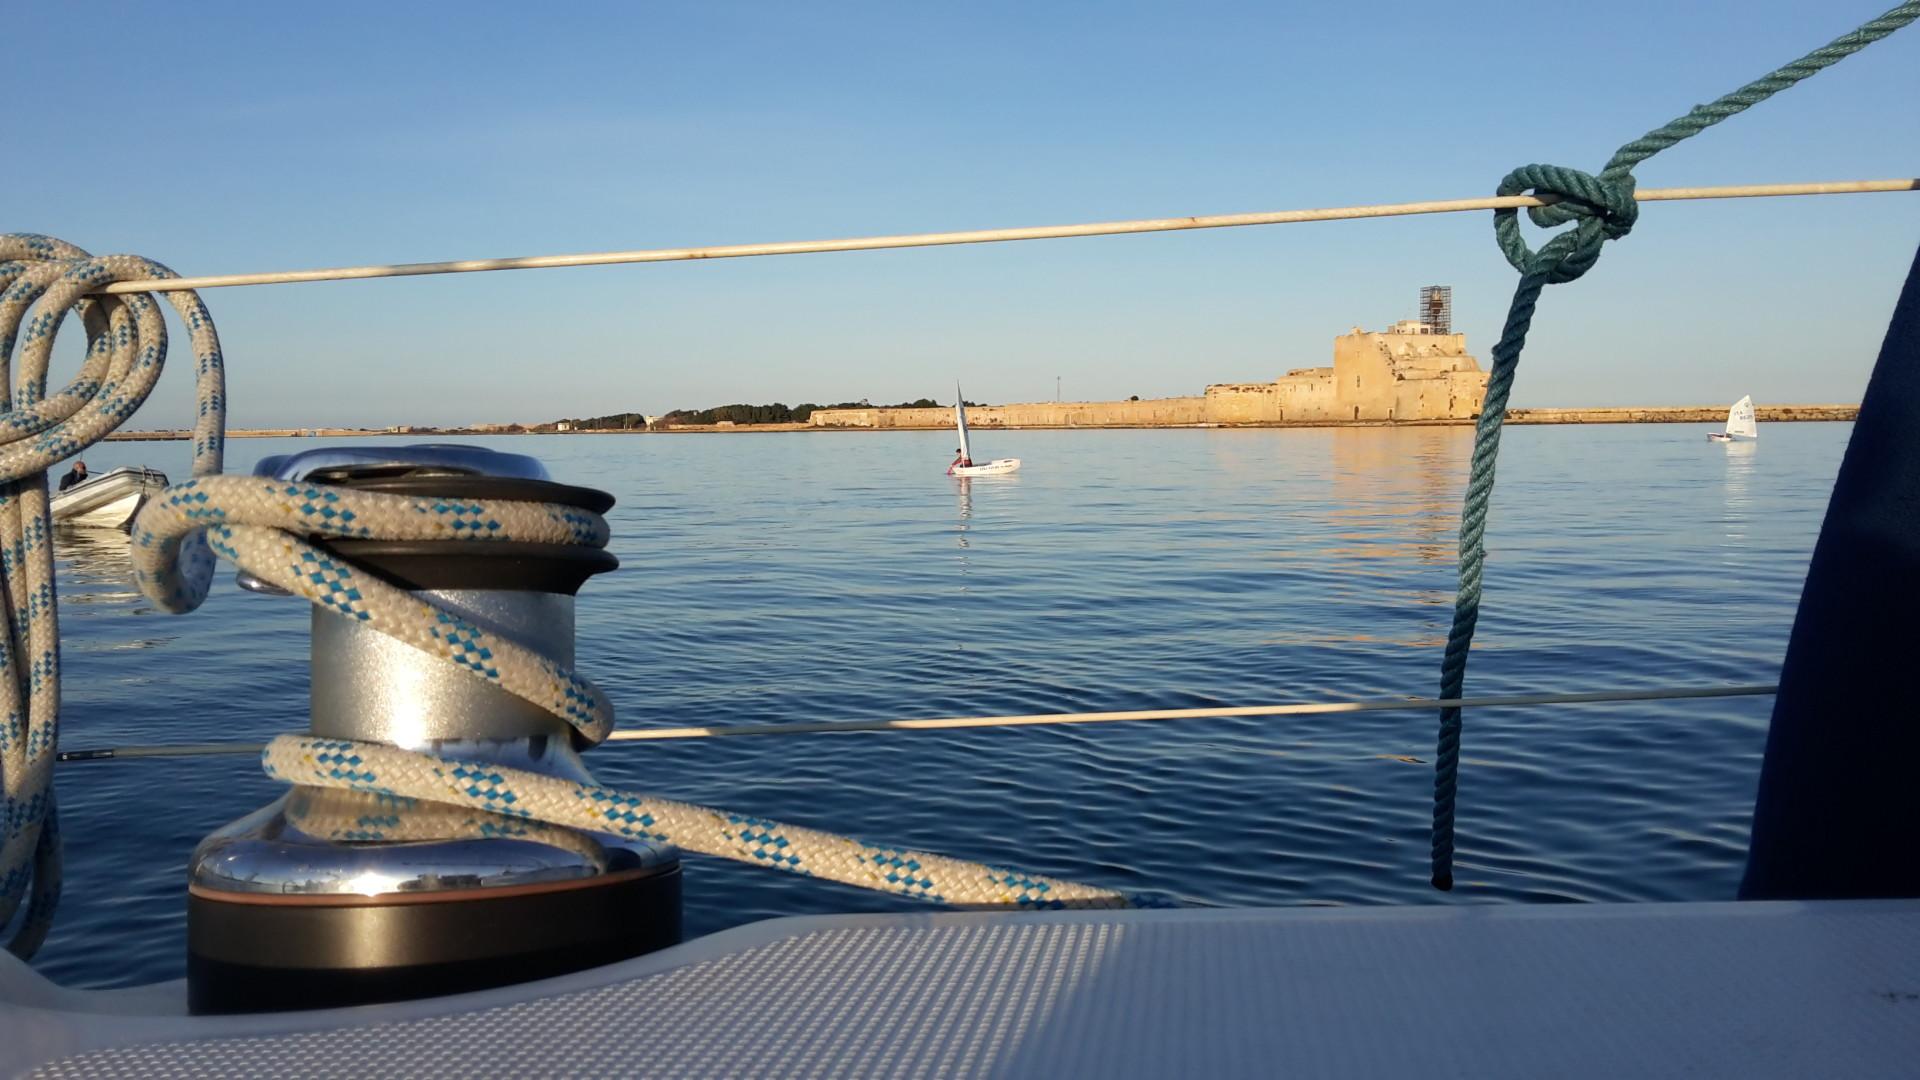 Scuola-di-vela-lega-navale-LNI-Brindisi (16)